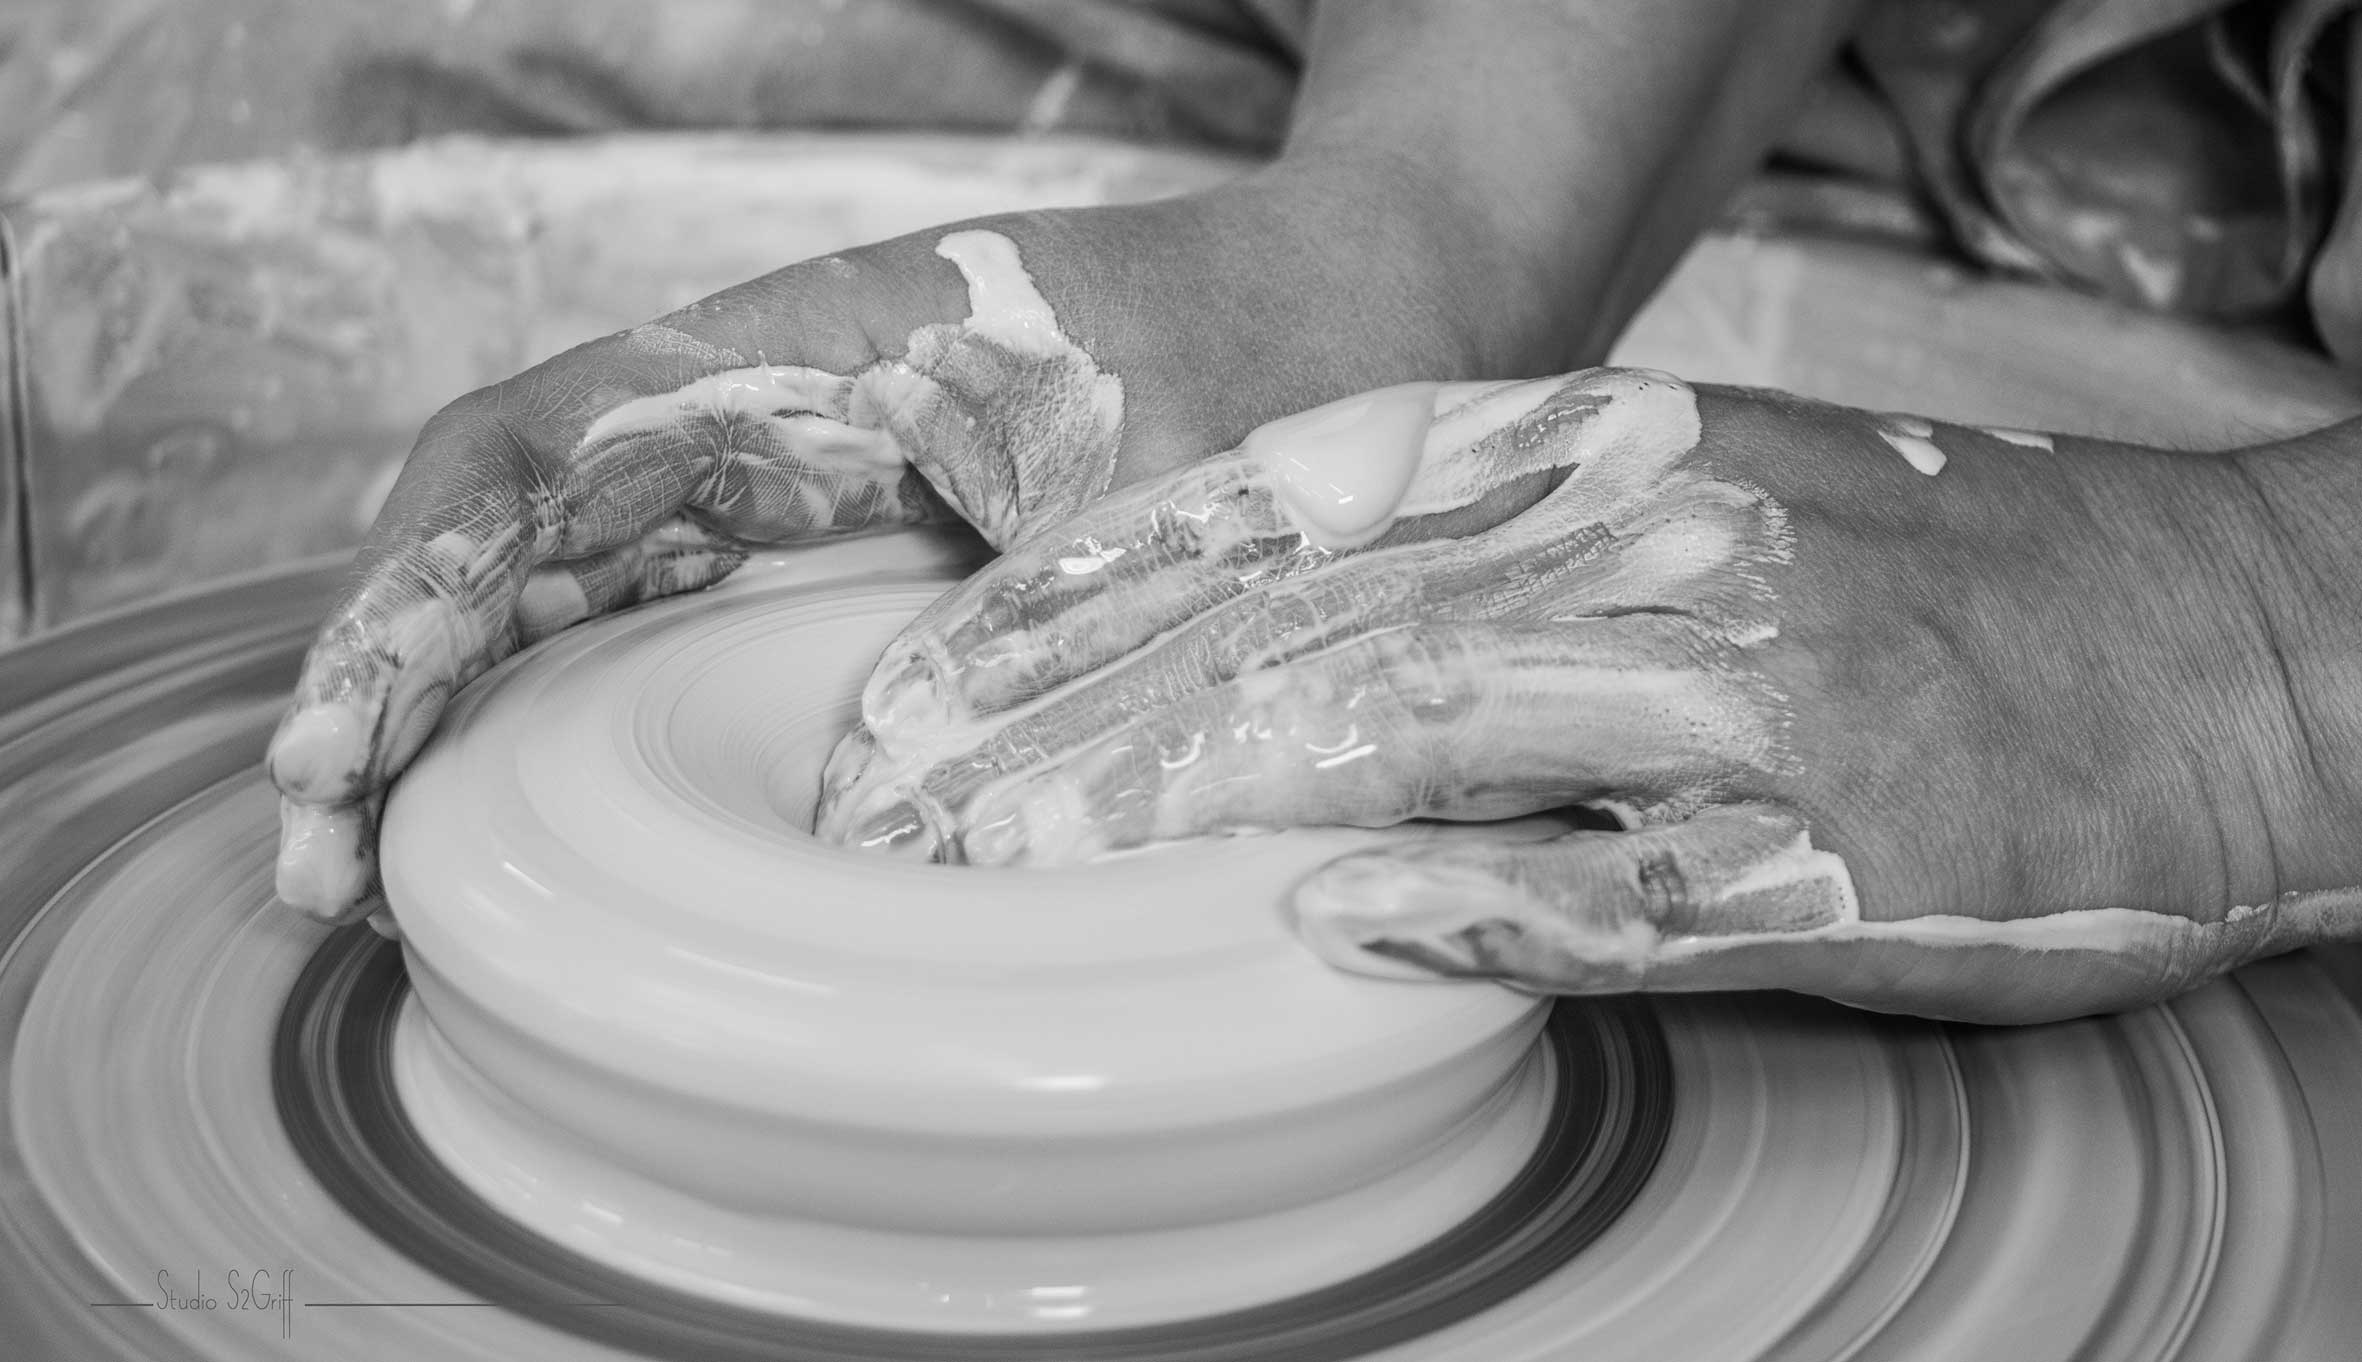 tournage-poterie-porcelaine